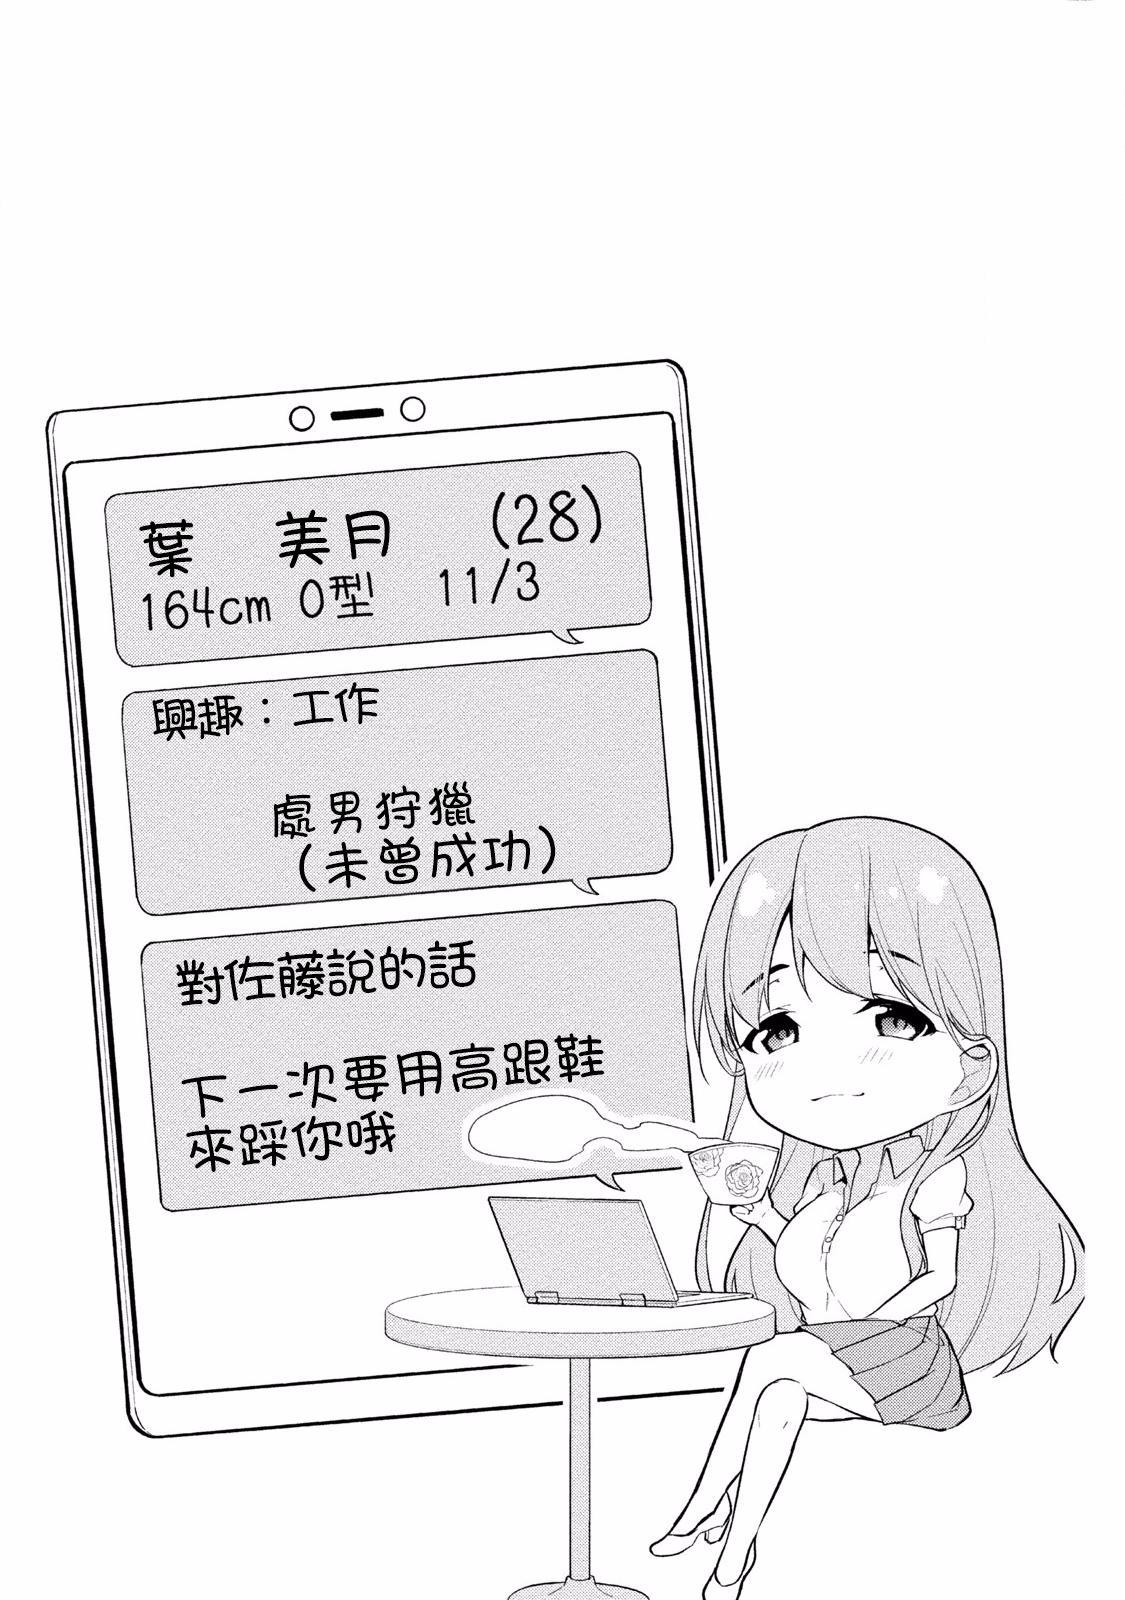 [Yukino] Satou-kun wa Miteiru. ~Kami-sama Appli de Onnanoko no Kokoro o Nozoitara Do XX datta~ Ch. 2 | 佐藤君正在偷窥。~用神大人的APP偷窥女孩子的内心却发现原来是抖XX~02话 [Chinese] [前线作♂战♀基地] 22